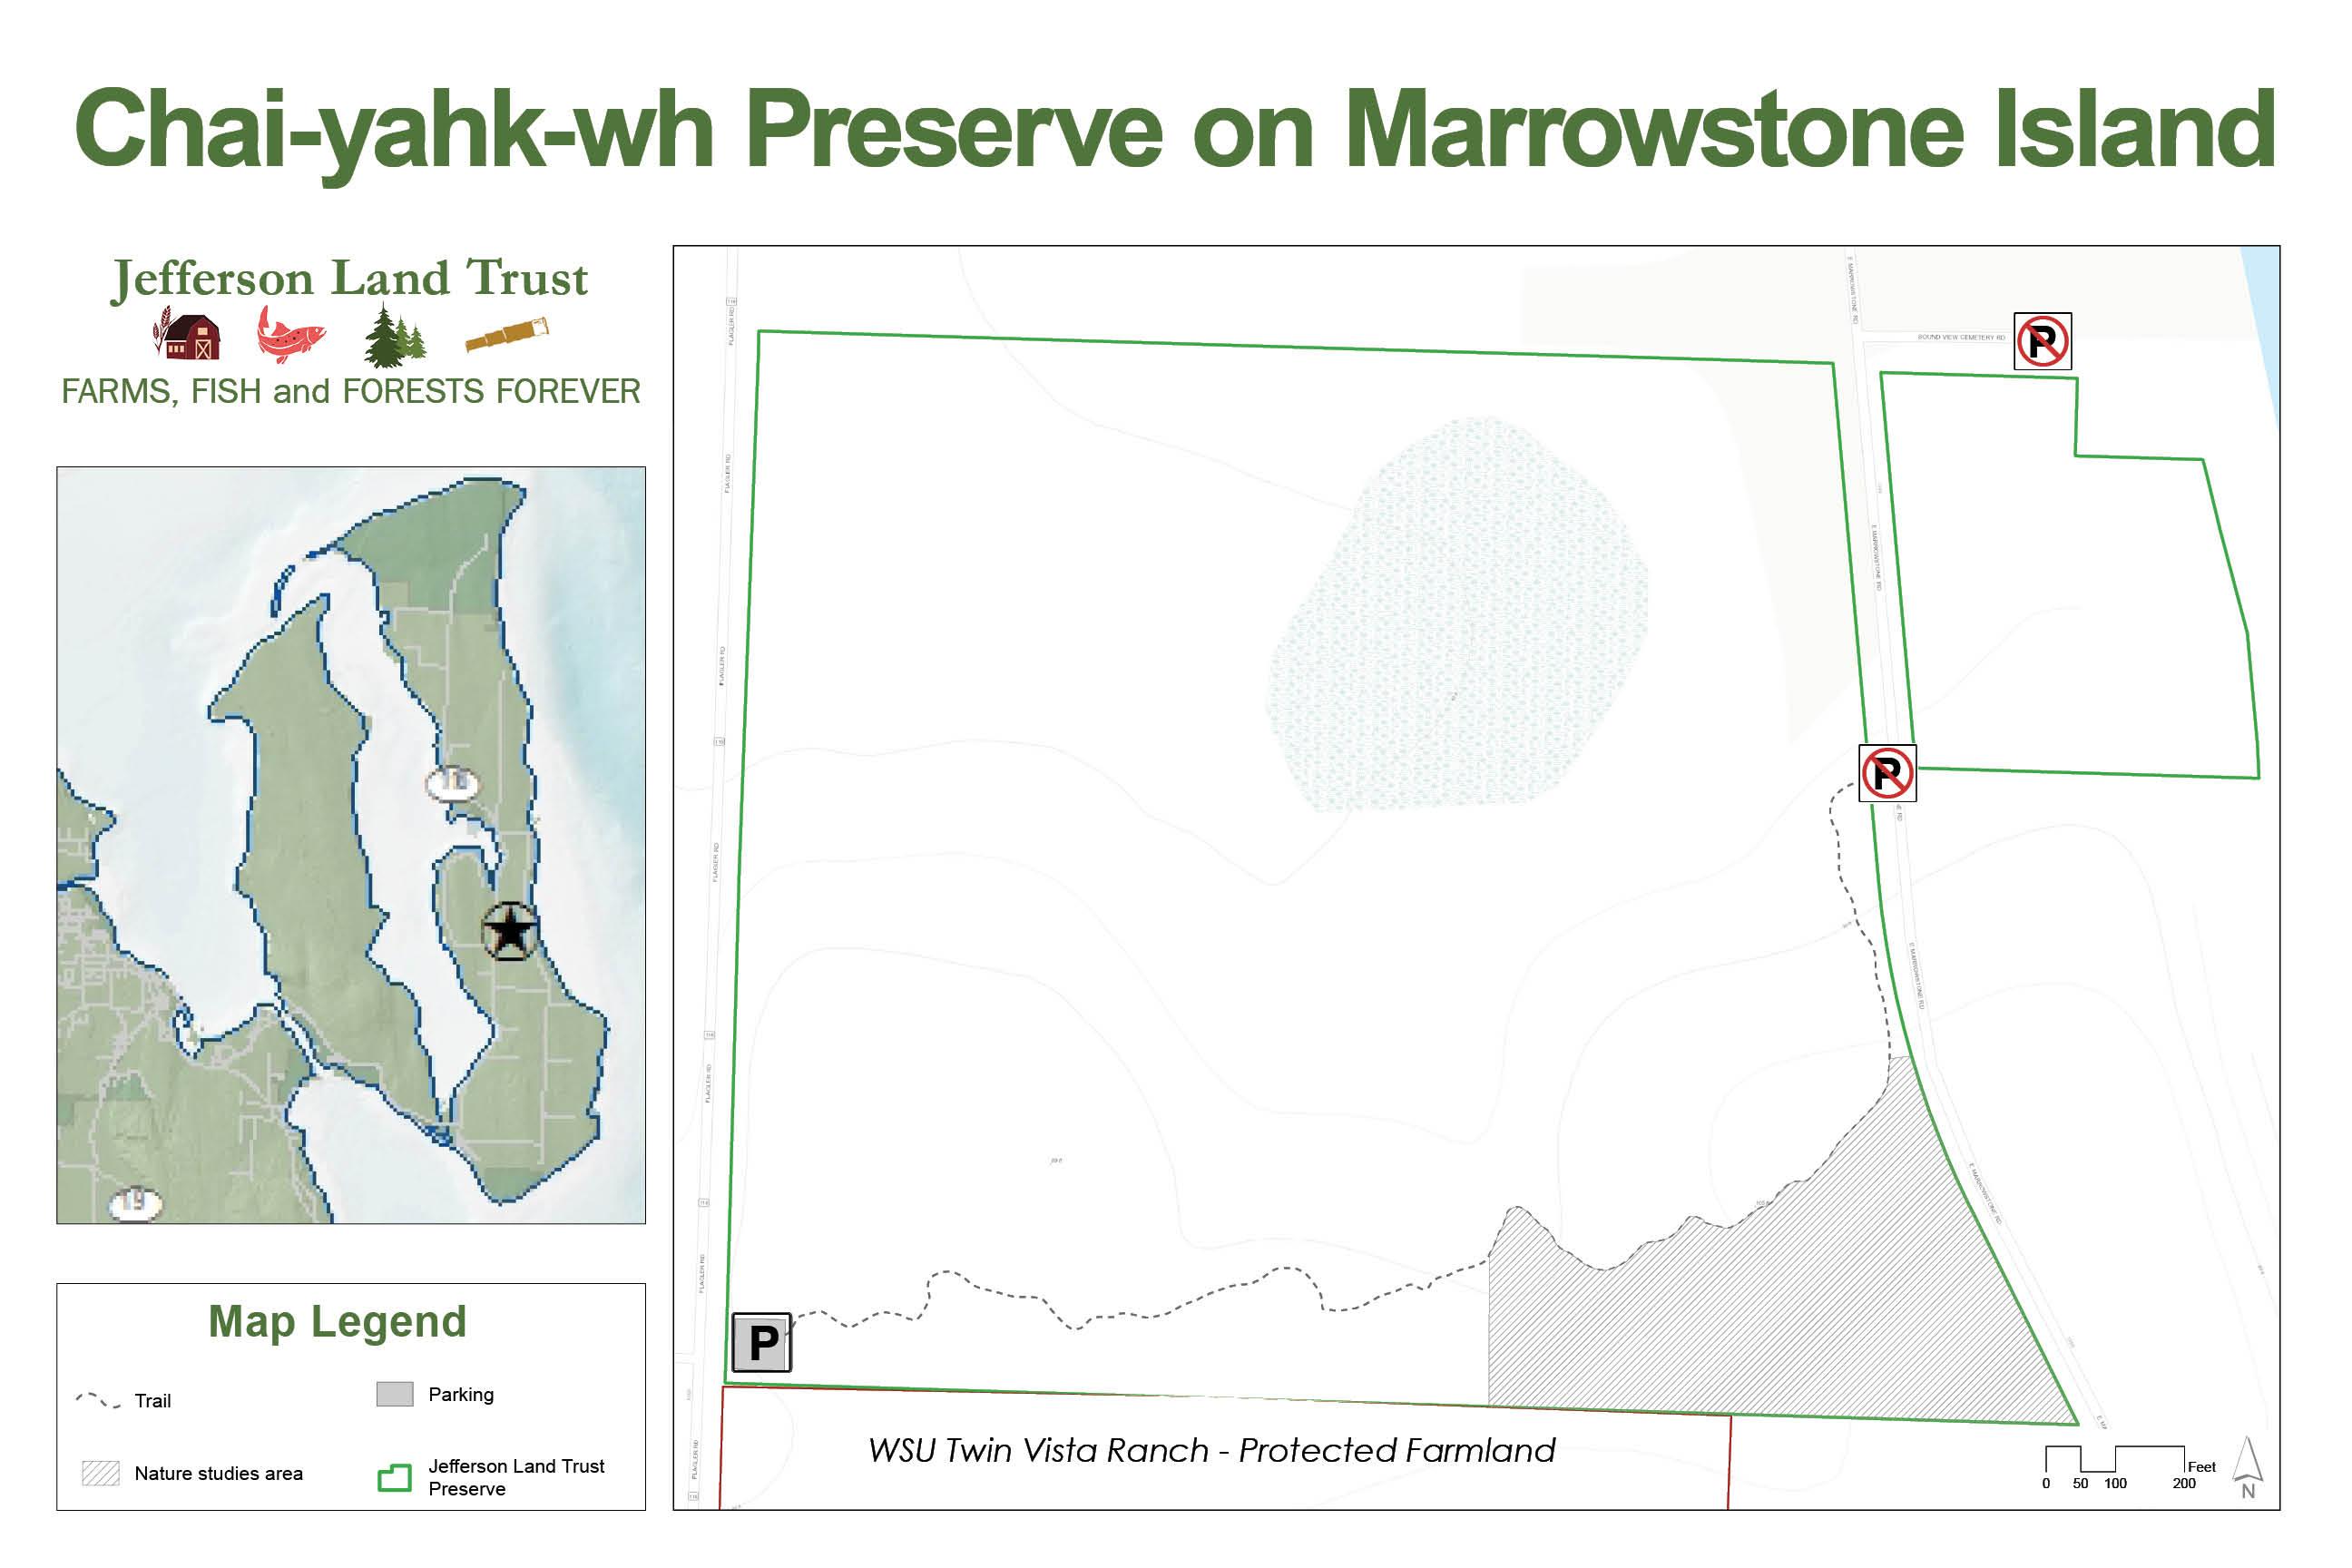 Chai-yahk-wh Preserve Trail Map